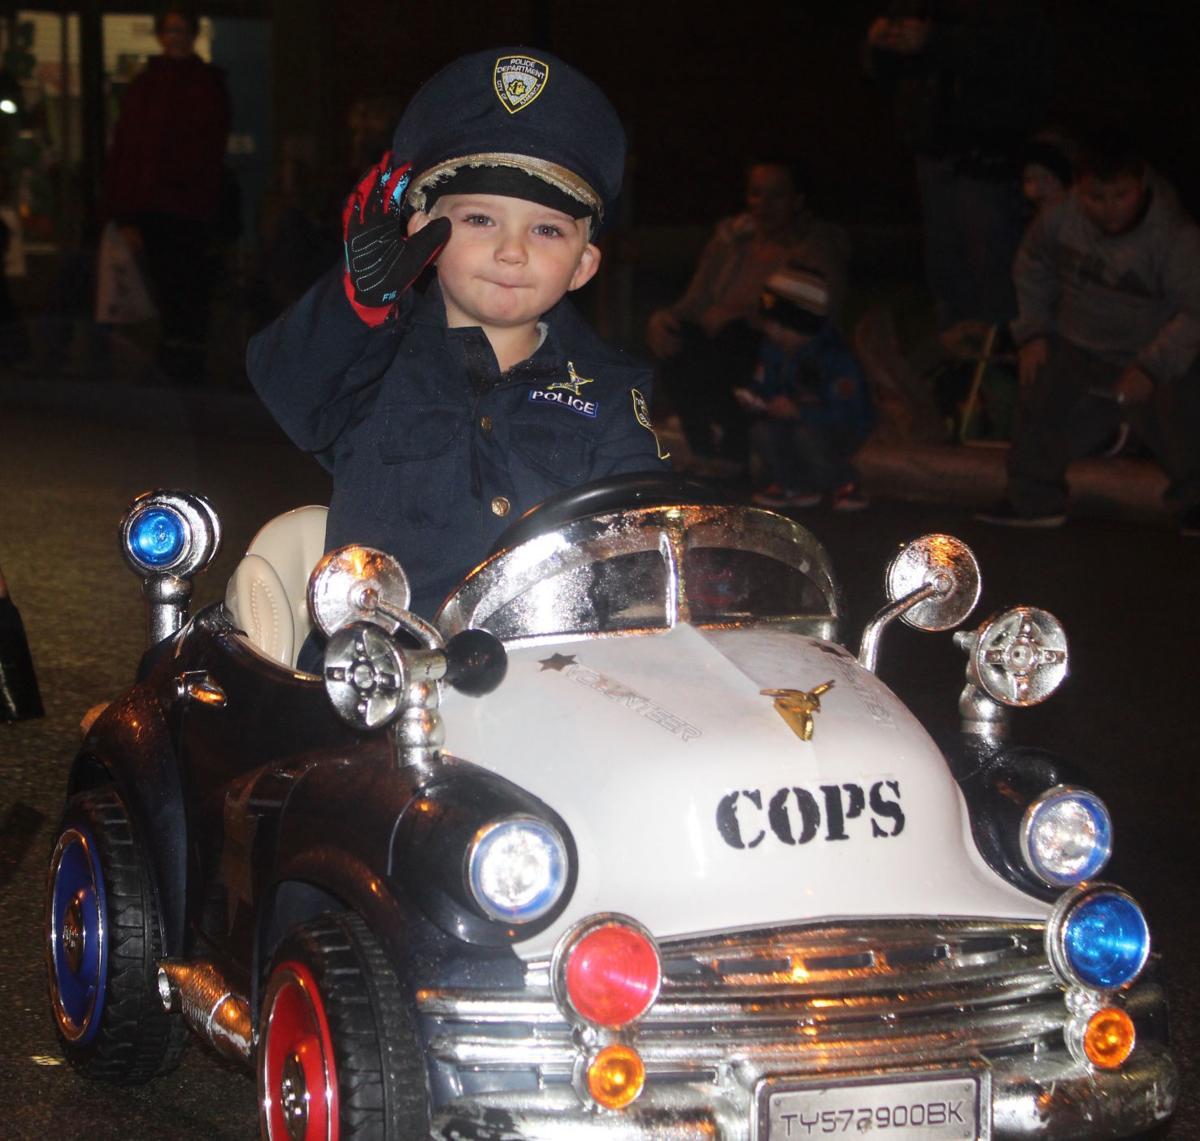 Lil cop